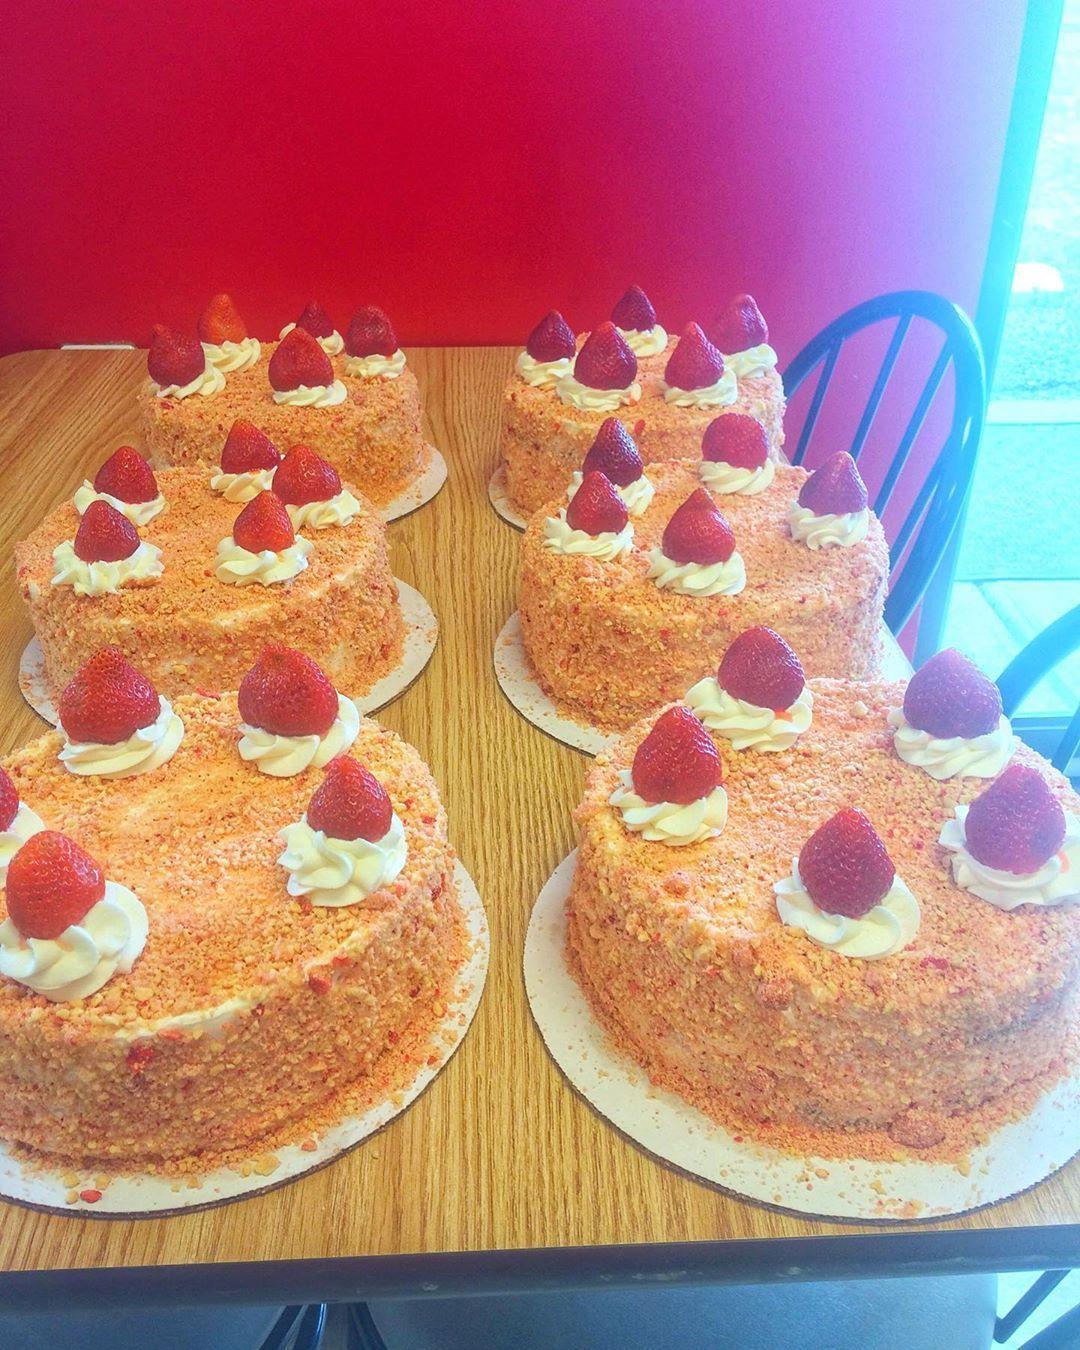 Probably my most POPULAR CAKE!!!! * * * * * * * _hub & my most POPULAR CAKE!!!! #stawberrycrunchcake * * * * * * * #chocolate  #cake #guiltypleasure #comfortfood #sweets #sweet #dessert #desserts #baking #bakedgoods #treats #mom_hub &